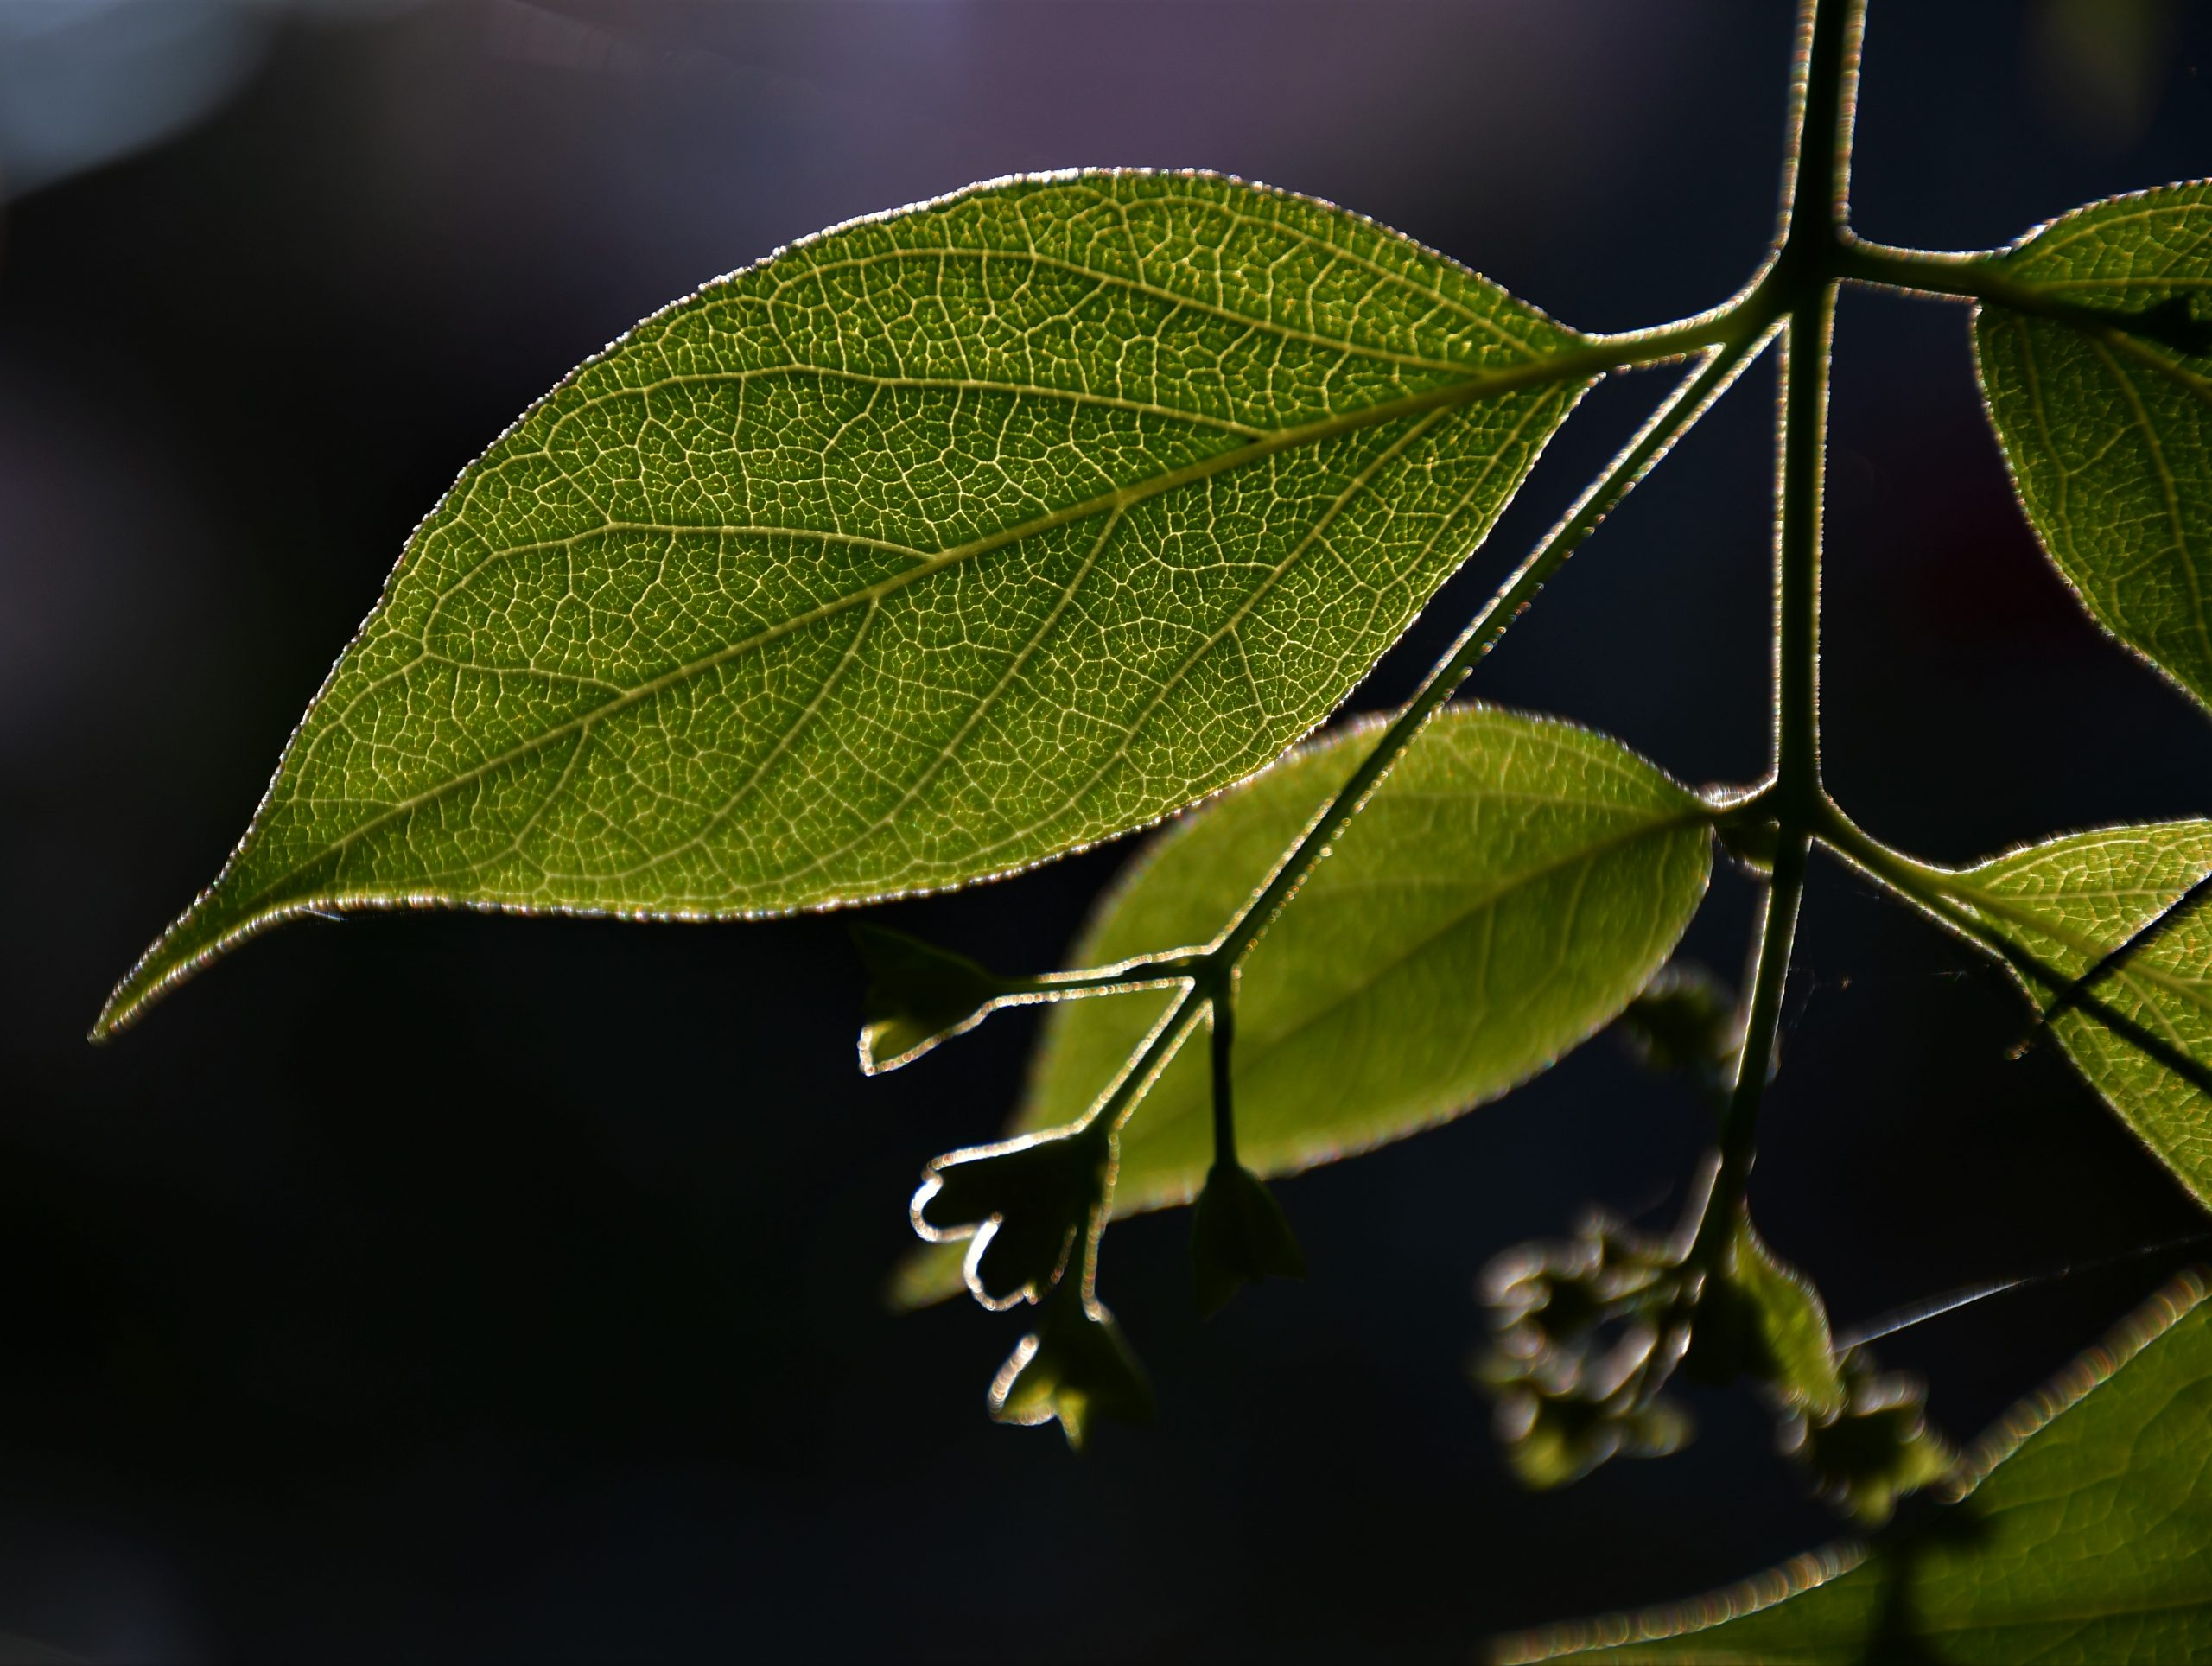 Leaf of Night-Flowering Plant in sunlight